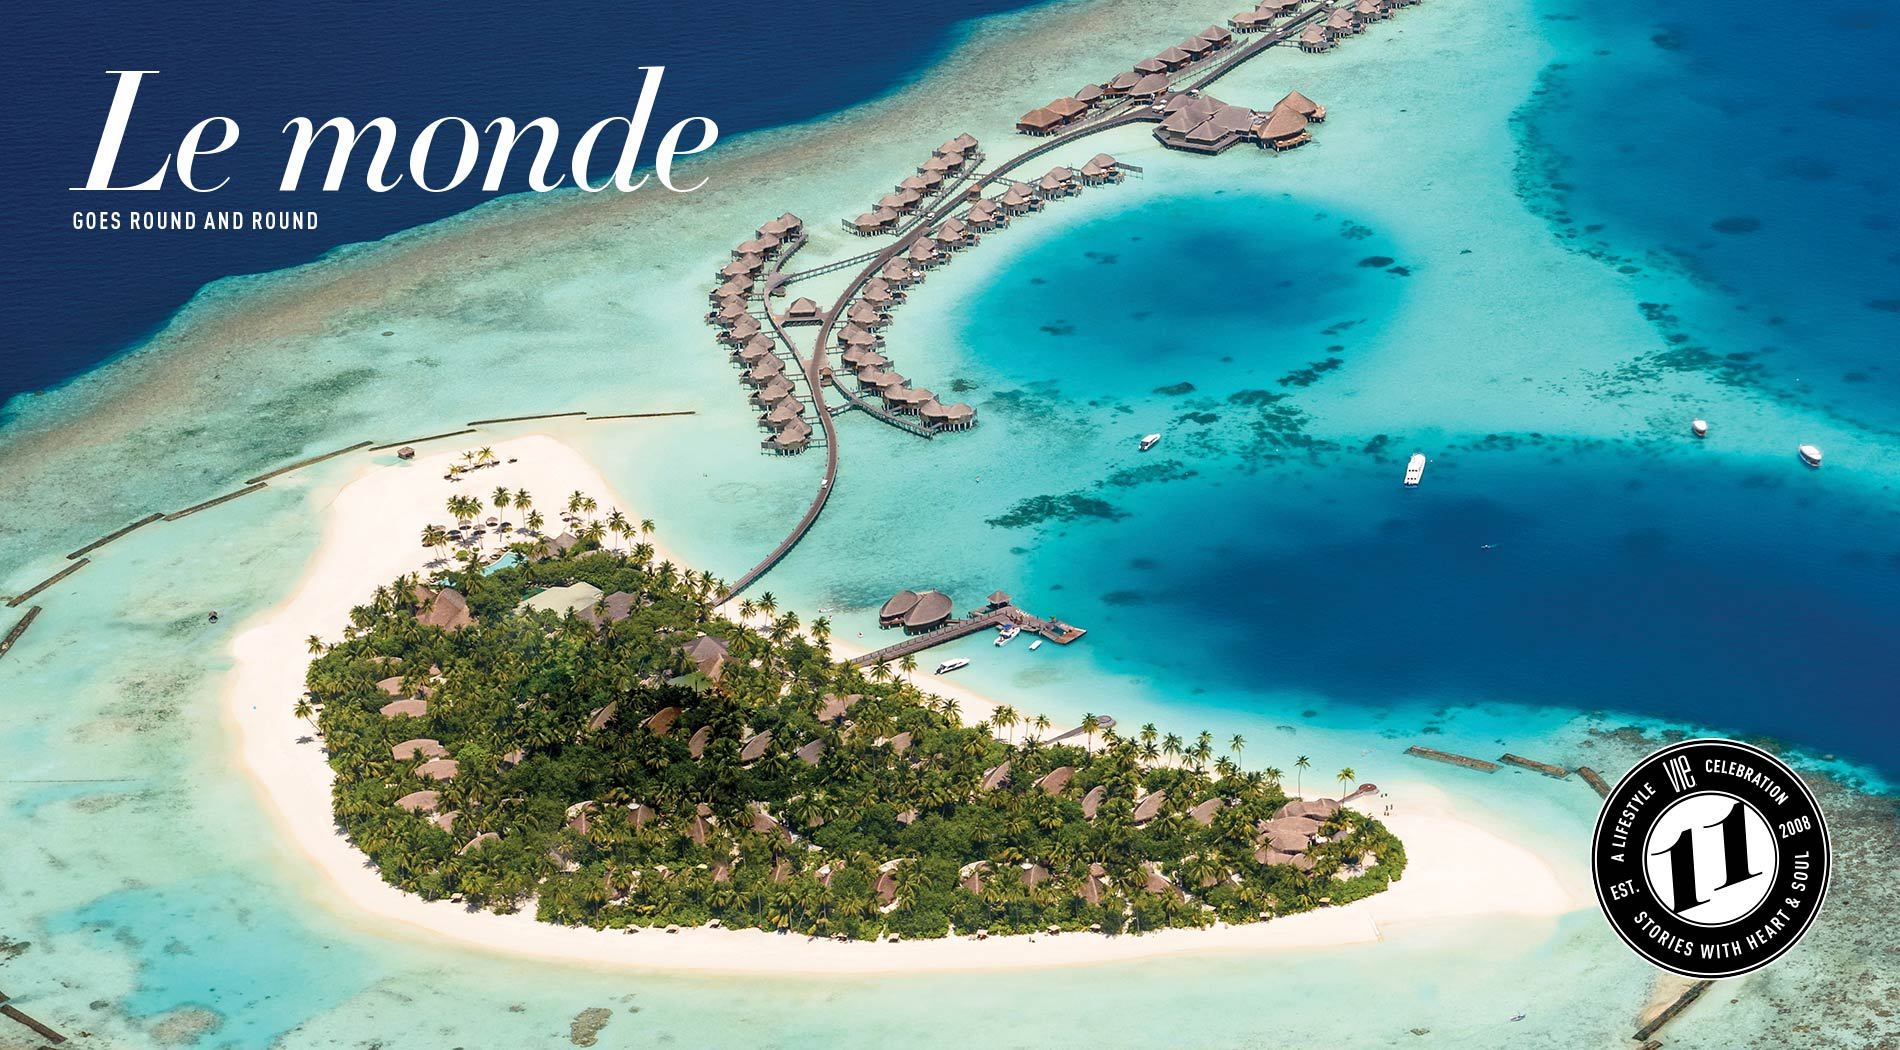 VIE Magazine - January 2019 - Southern Sophisticate Issue - La Monde